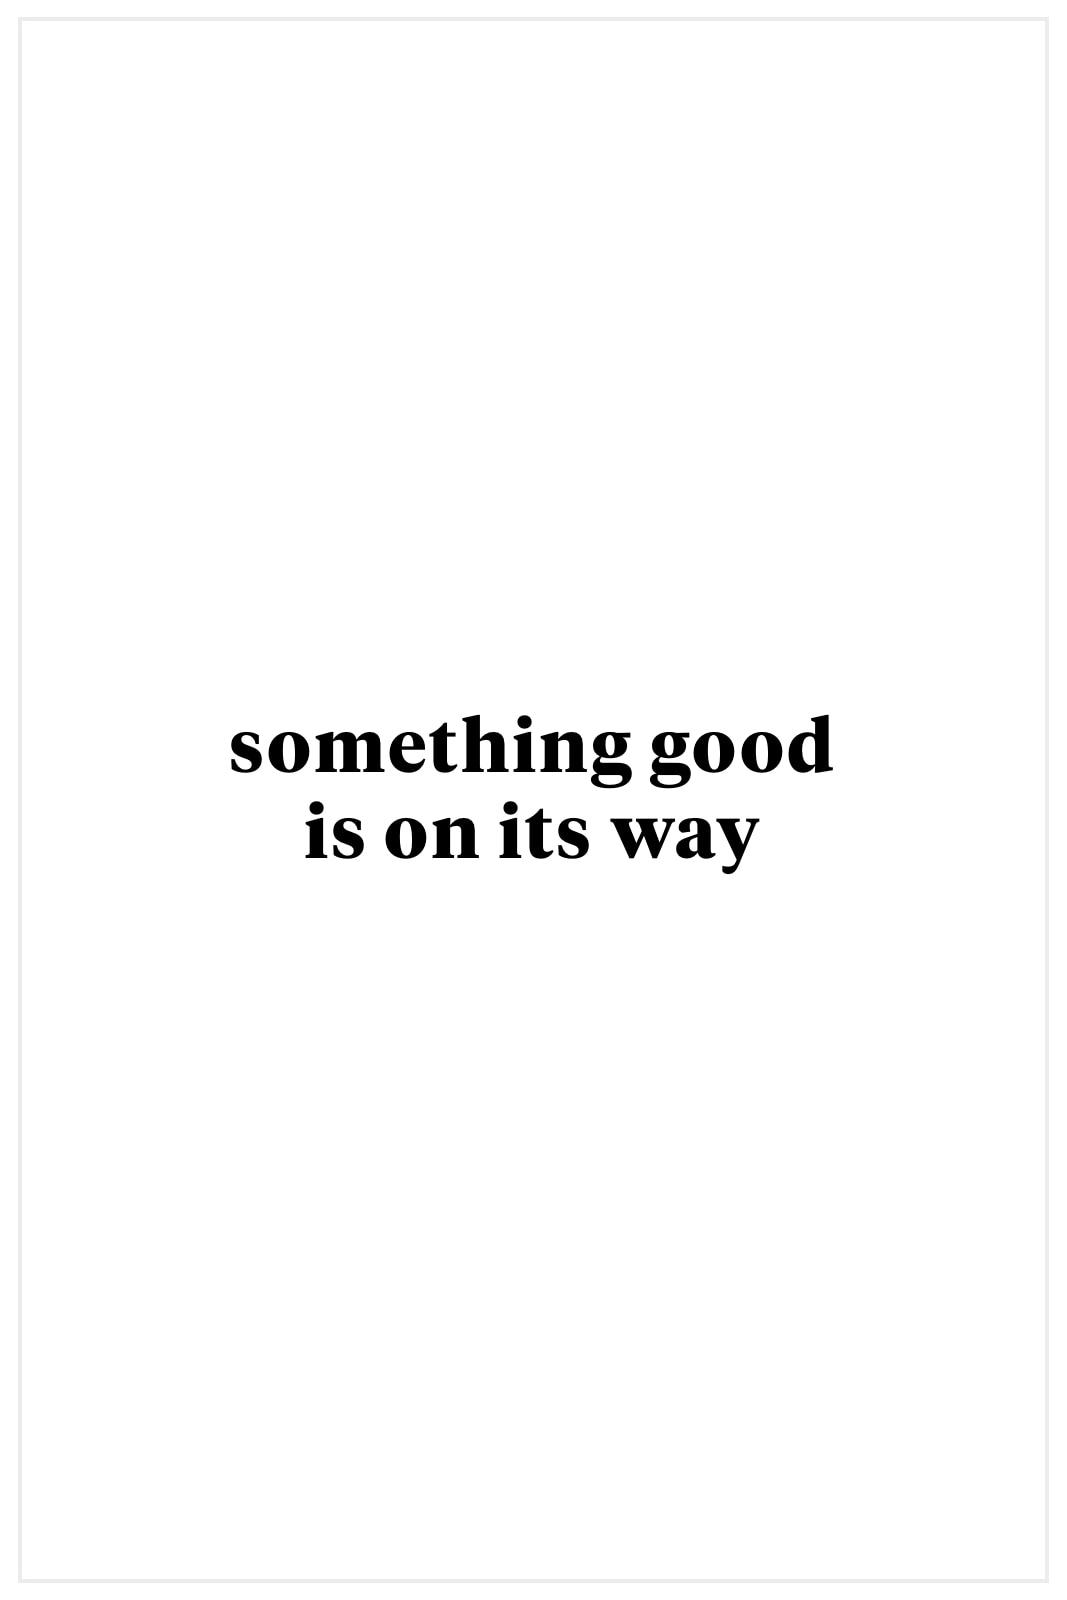 Allison joy Conroy Hot Pink Cardigan